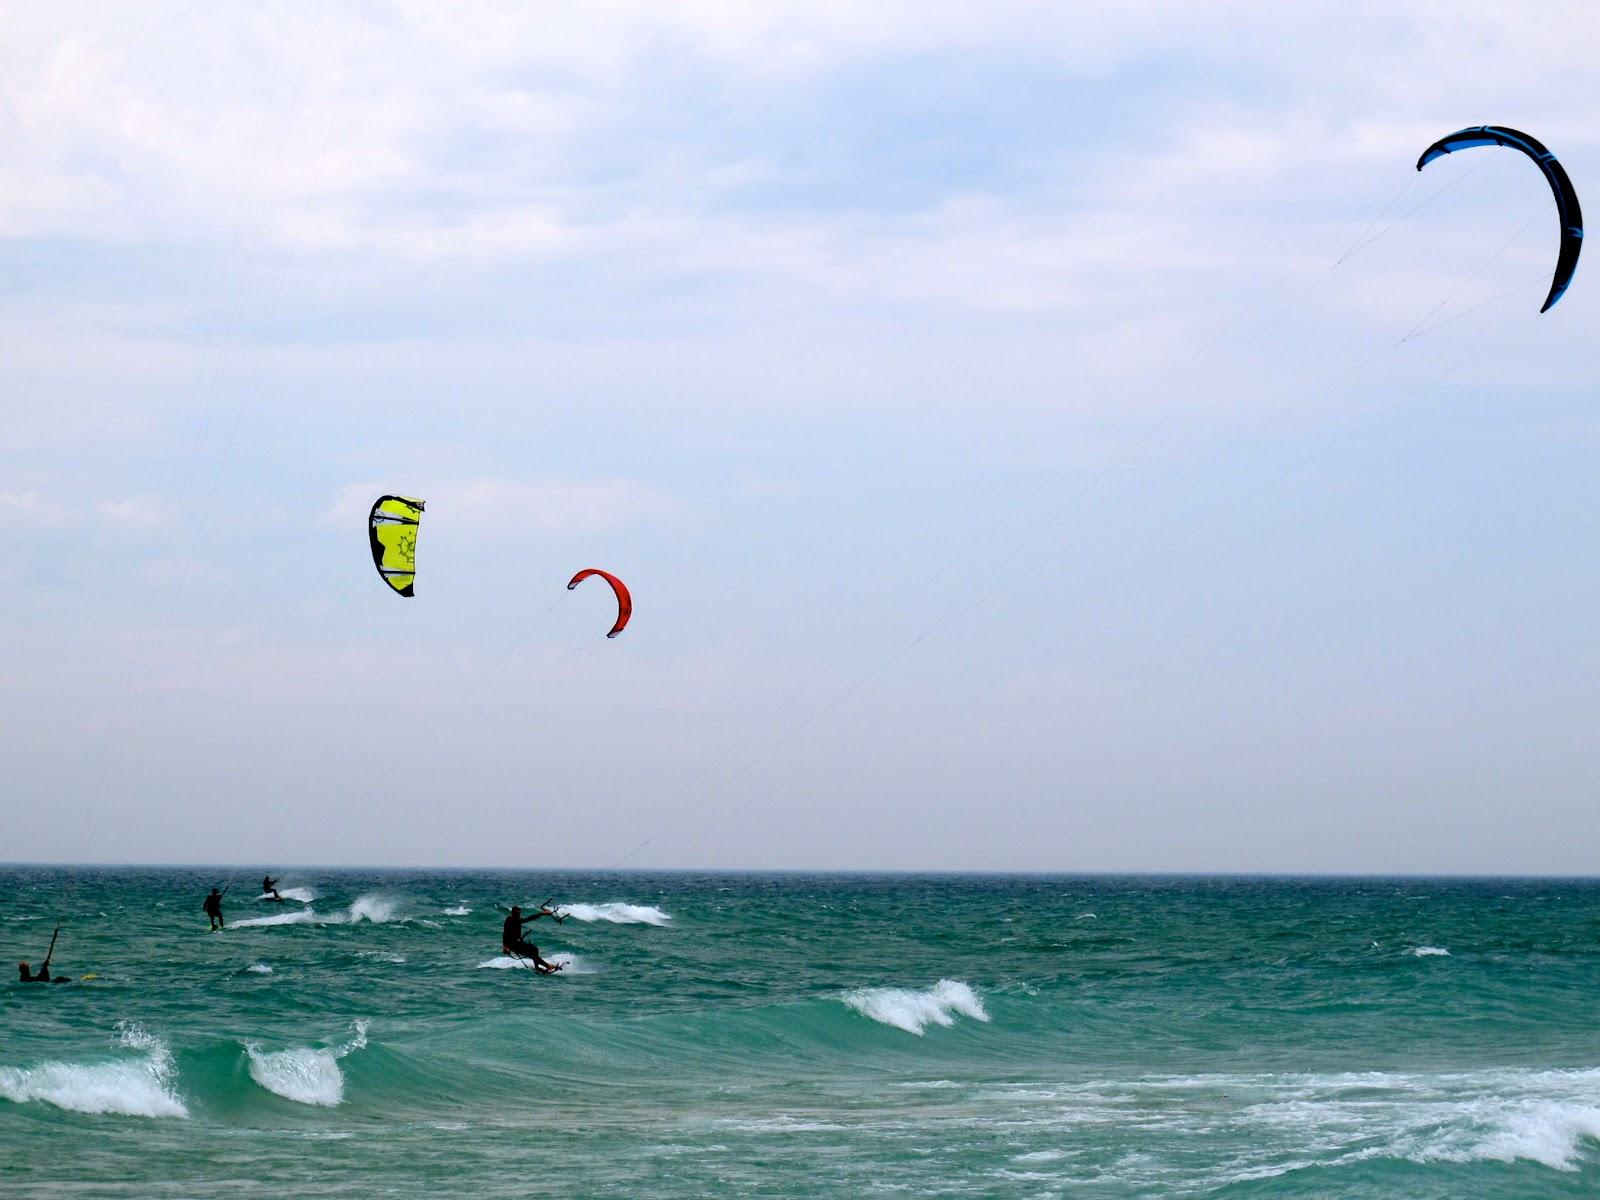 Windtraveler: Windtraveler: Kiteboarding